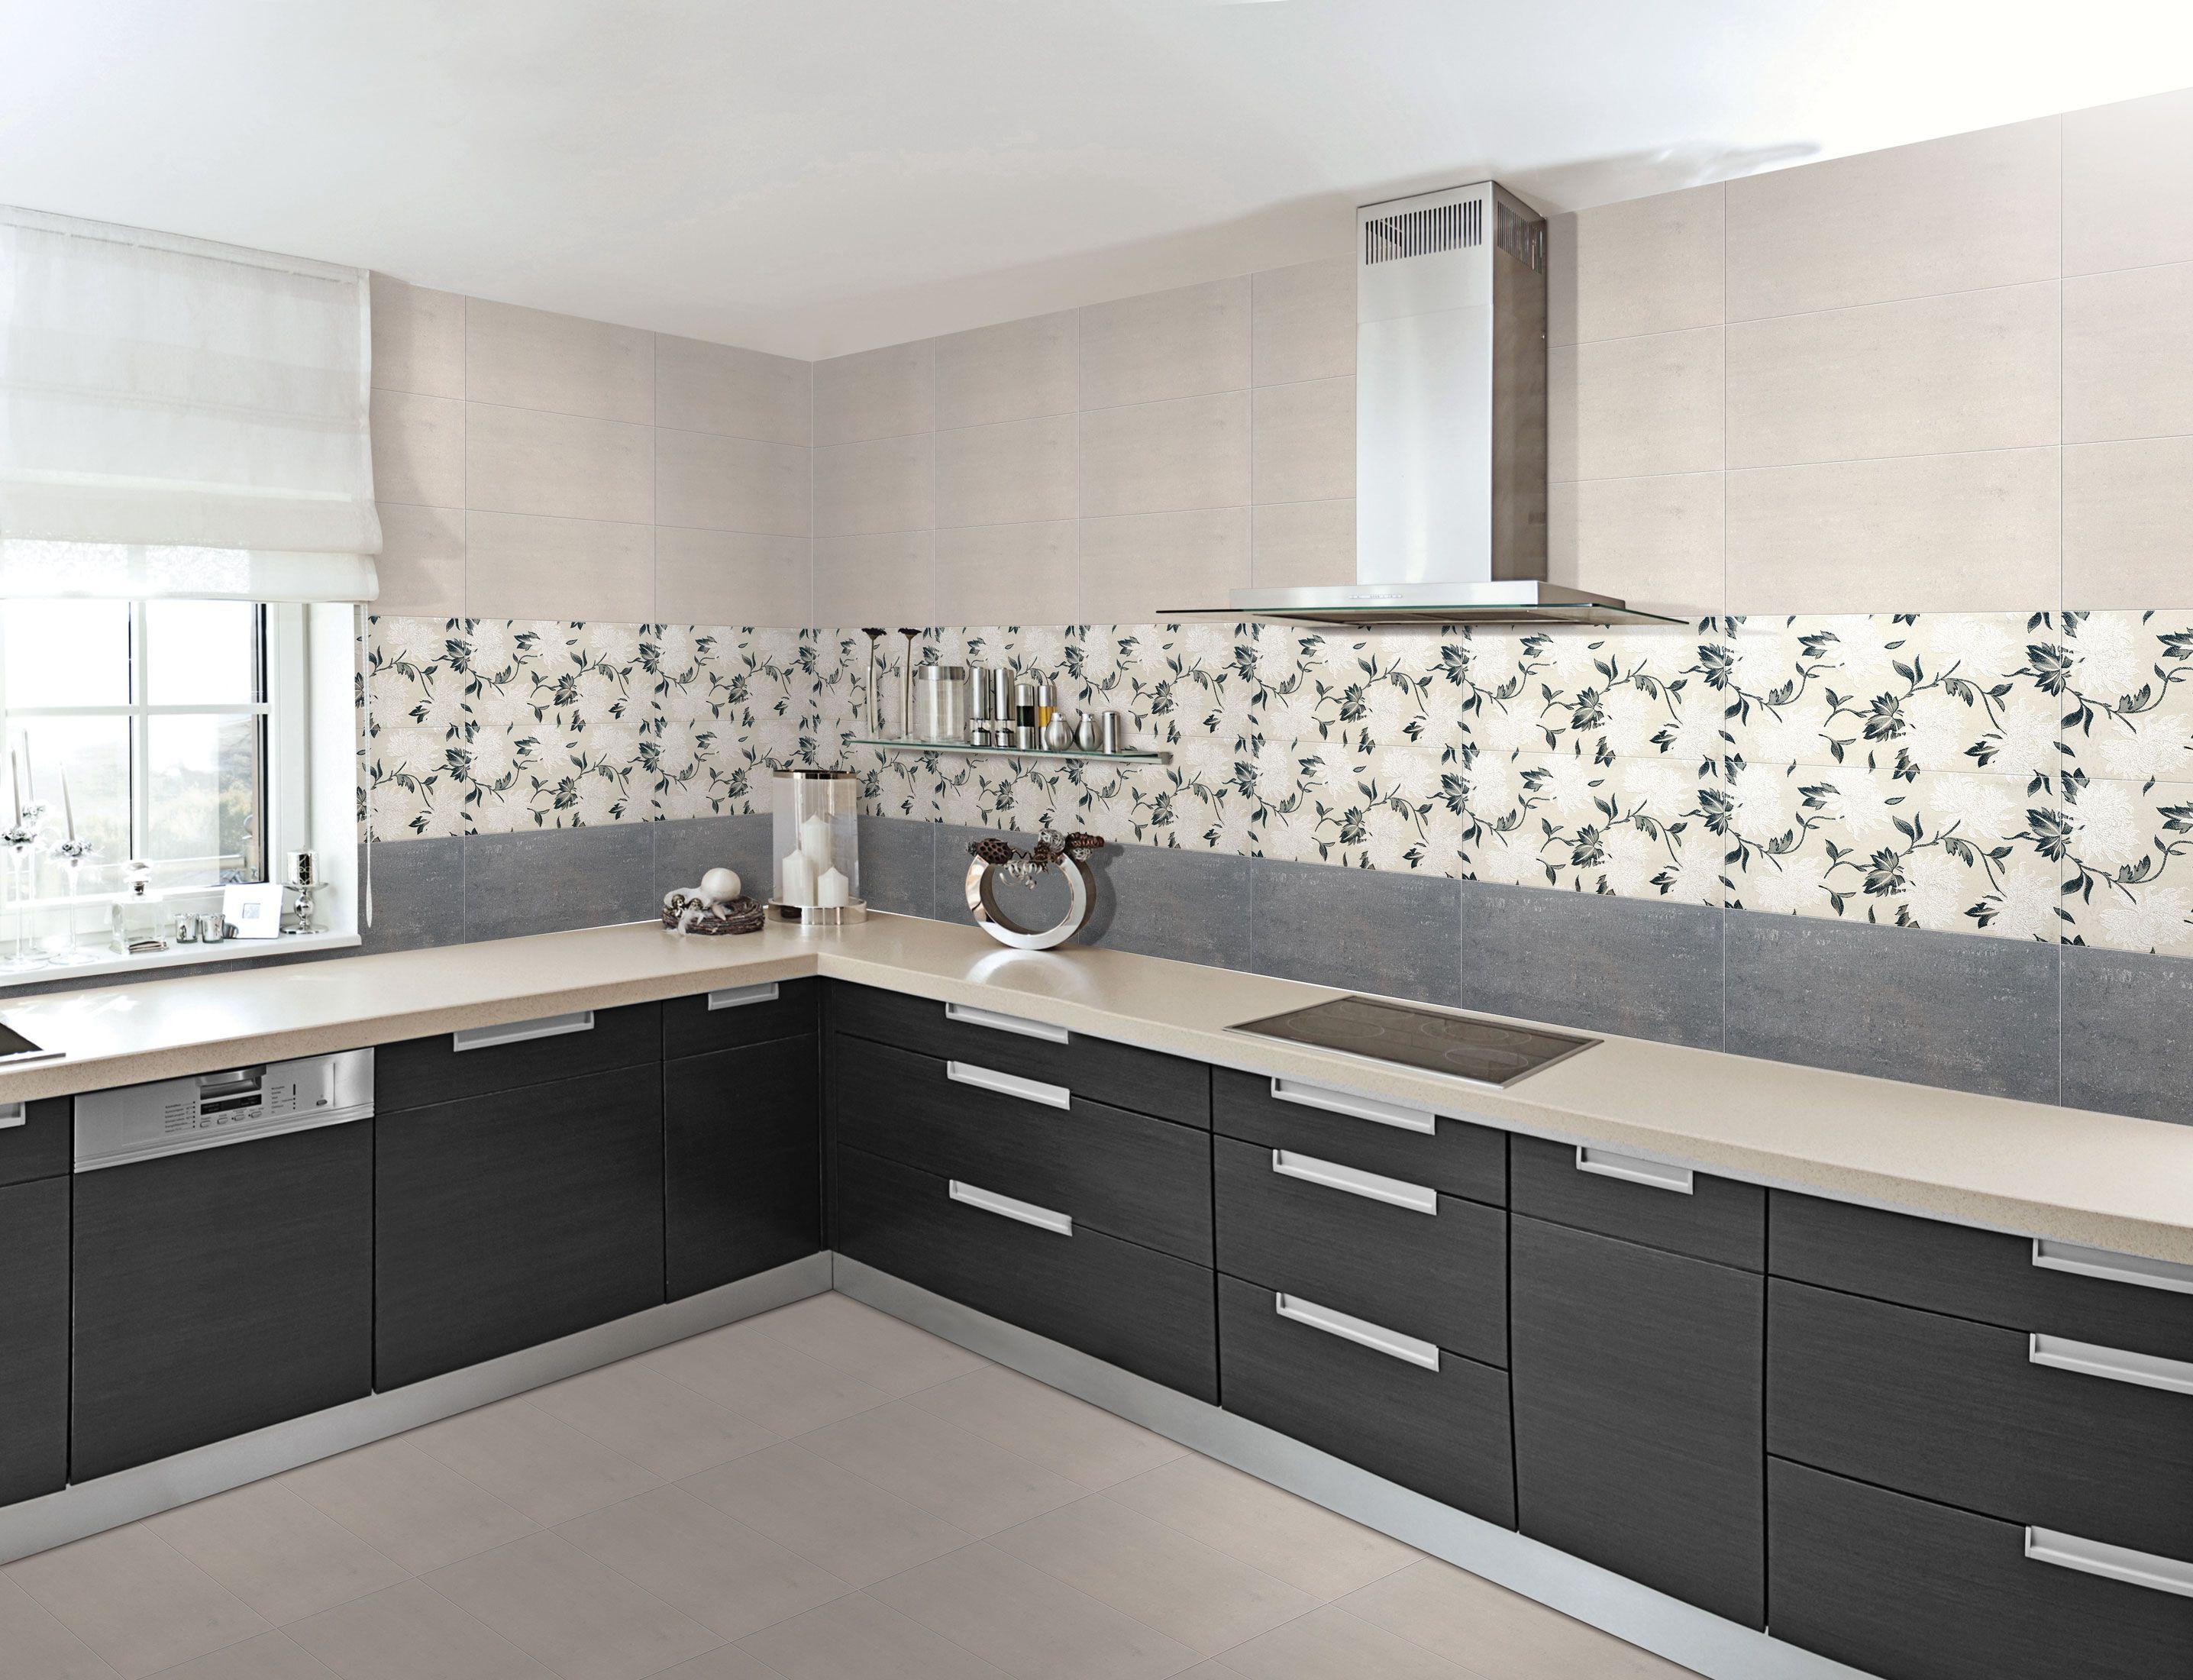 Kitchen Tile Designs Rustic Black Cabinets Buy Designer Floor Wall Tiles For Bathroom Bedroom Living Room Office Vitrified Exterior Ceramic Online India